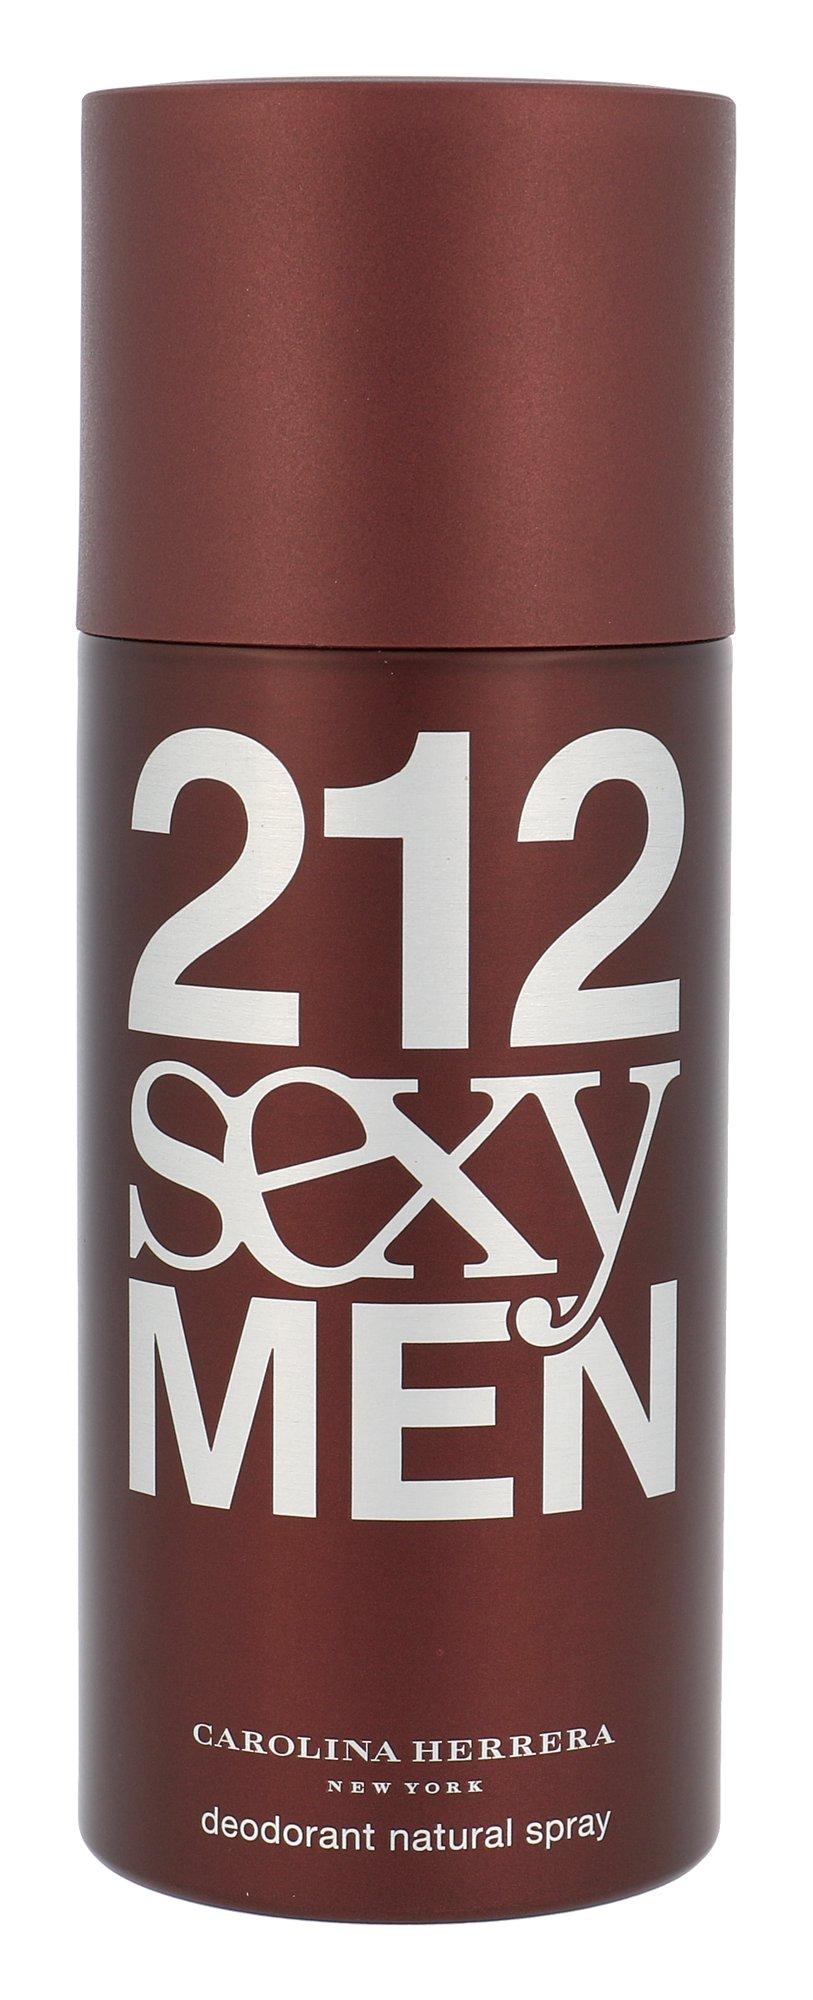 Carolina Herrera 212 Sexy Men, Deodorant 150ml